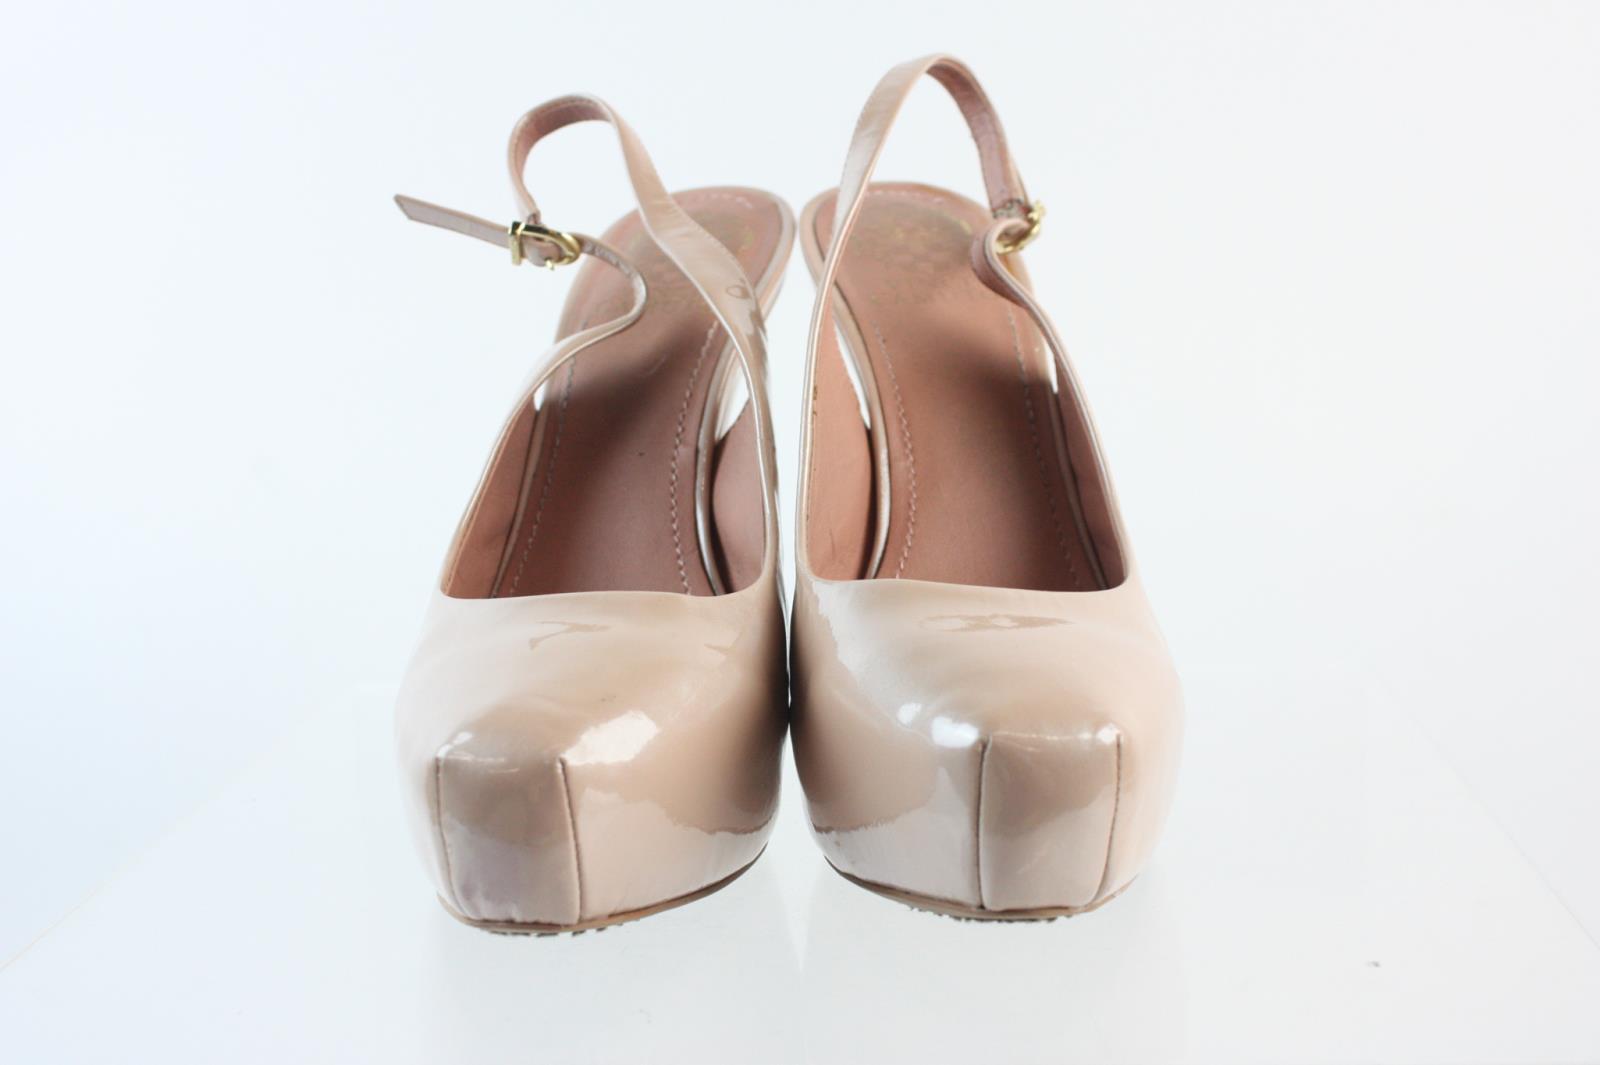 95db006d535 Vince Camuto Rose Gold Patent Leather Platform High Heel Ankle Strap Pumps  Sz 9